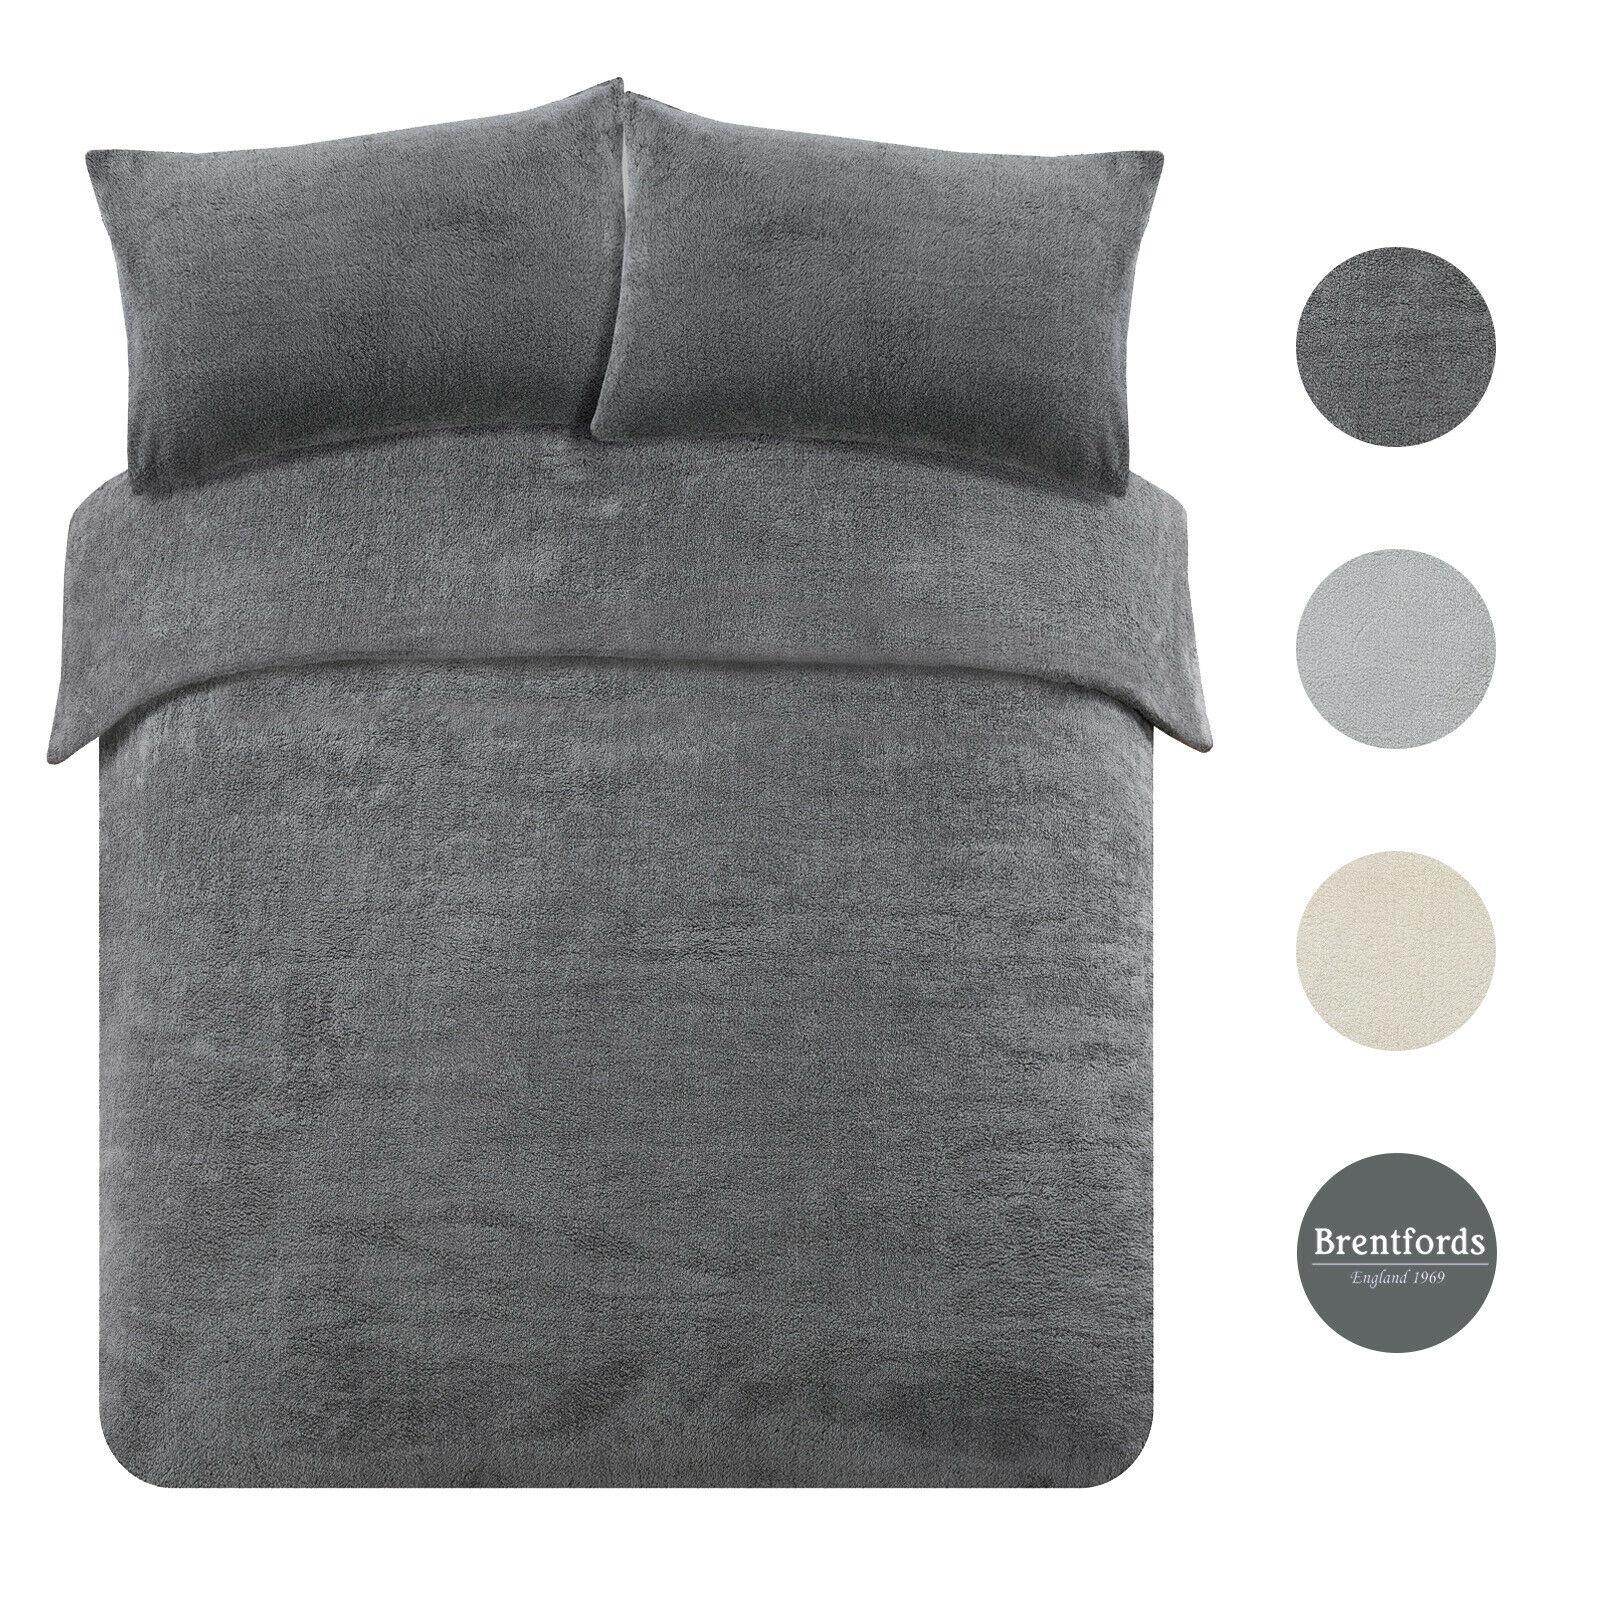 Brentfords Teddy Fleece Duvet Cover with Pillow Case Thermal Warm Bedding Set on ebay